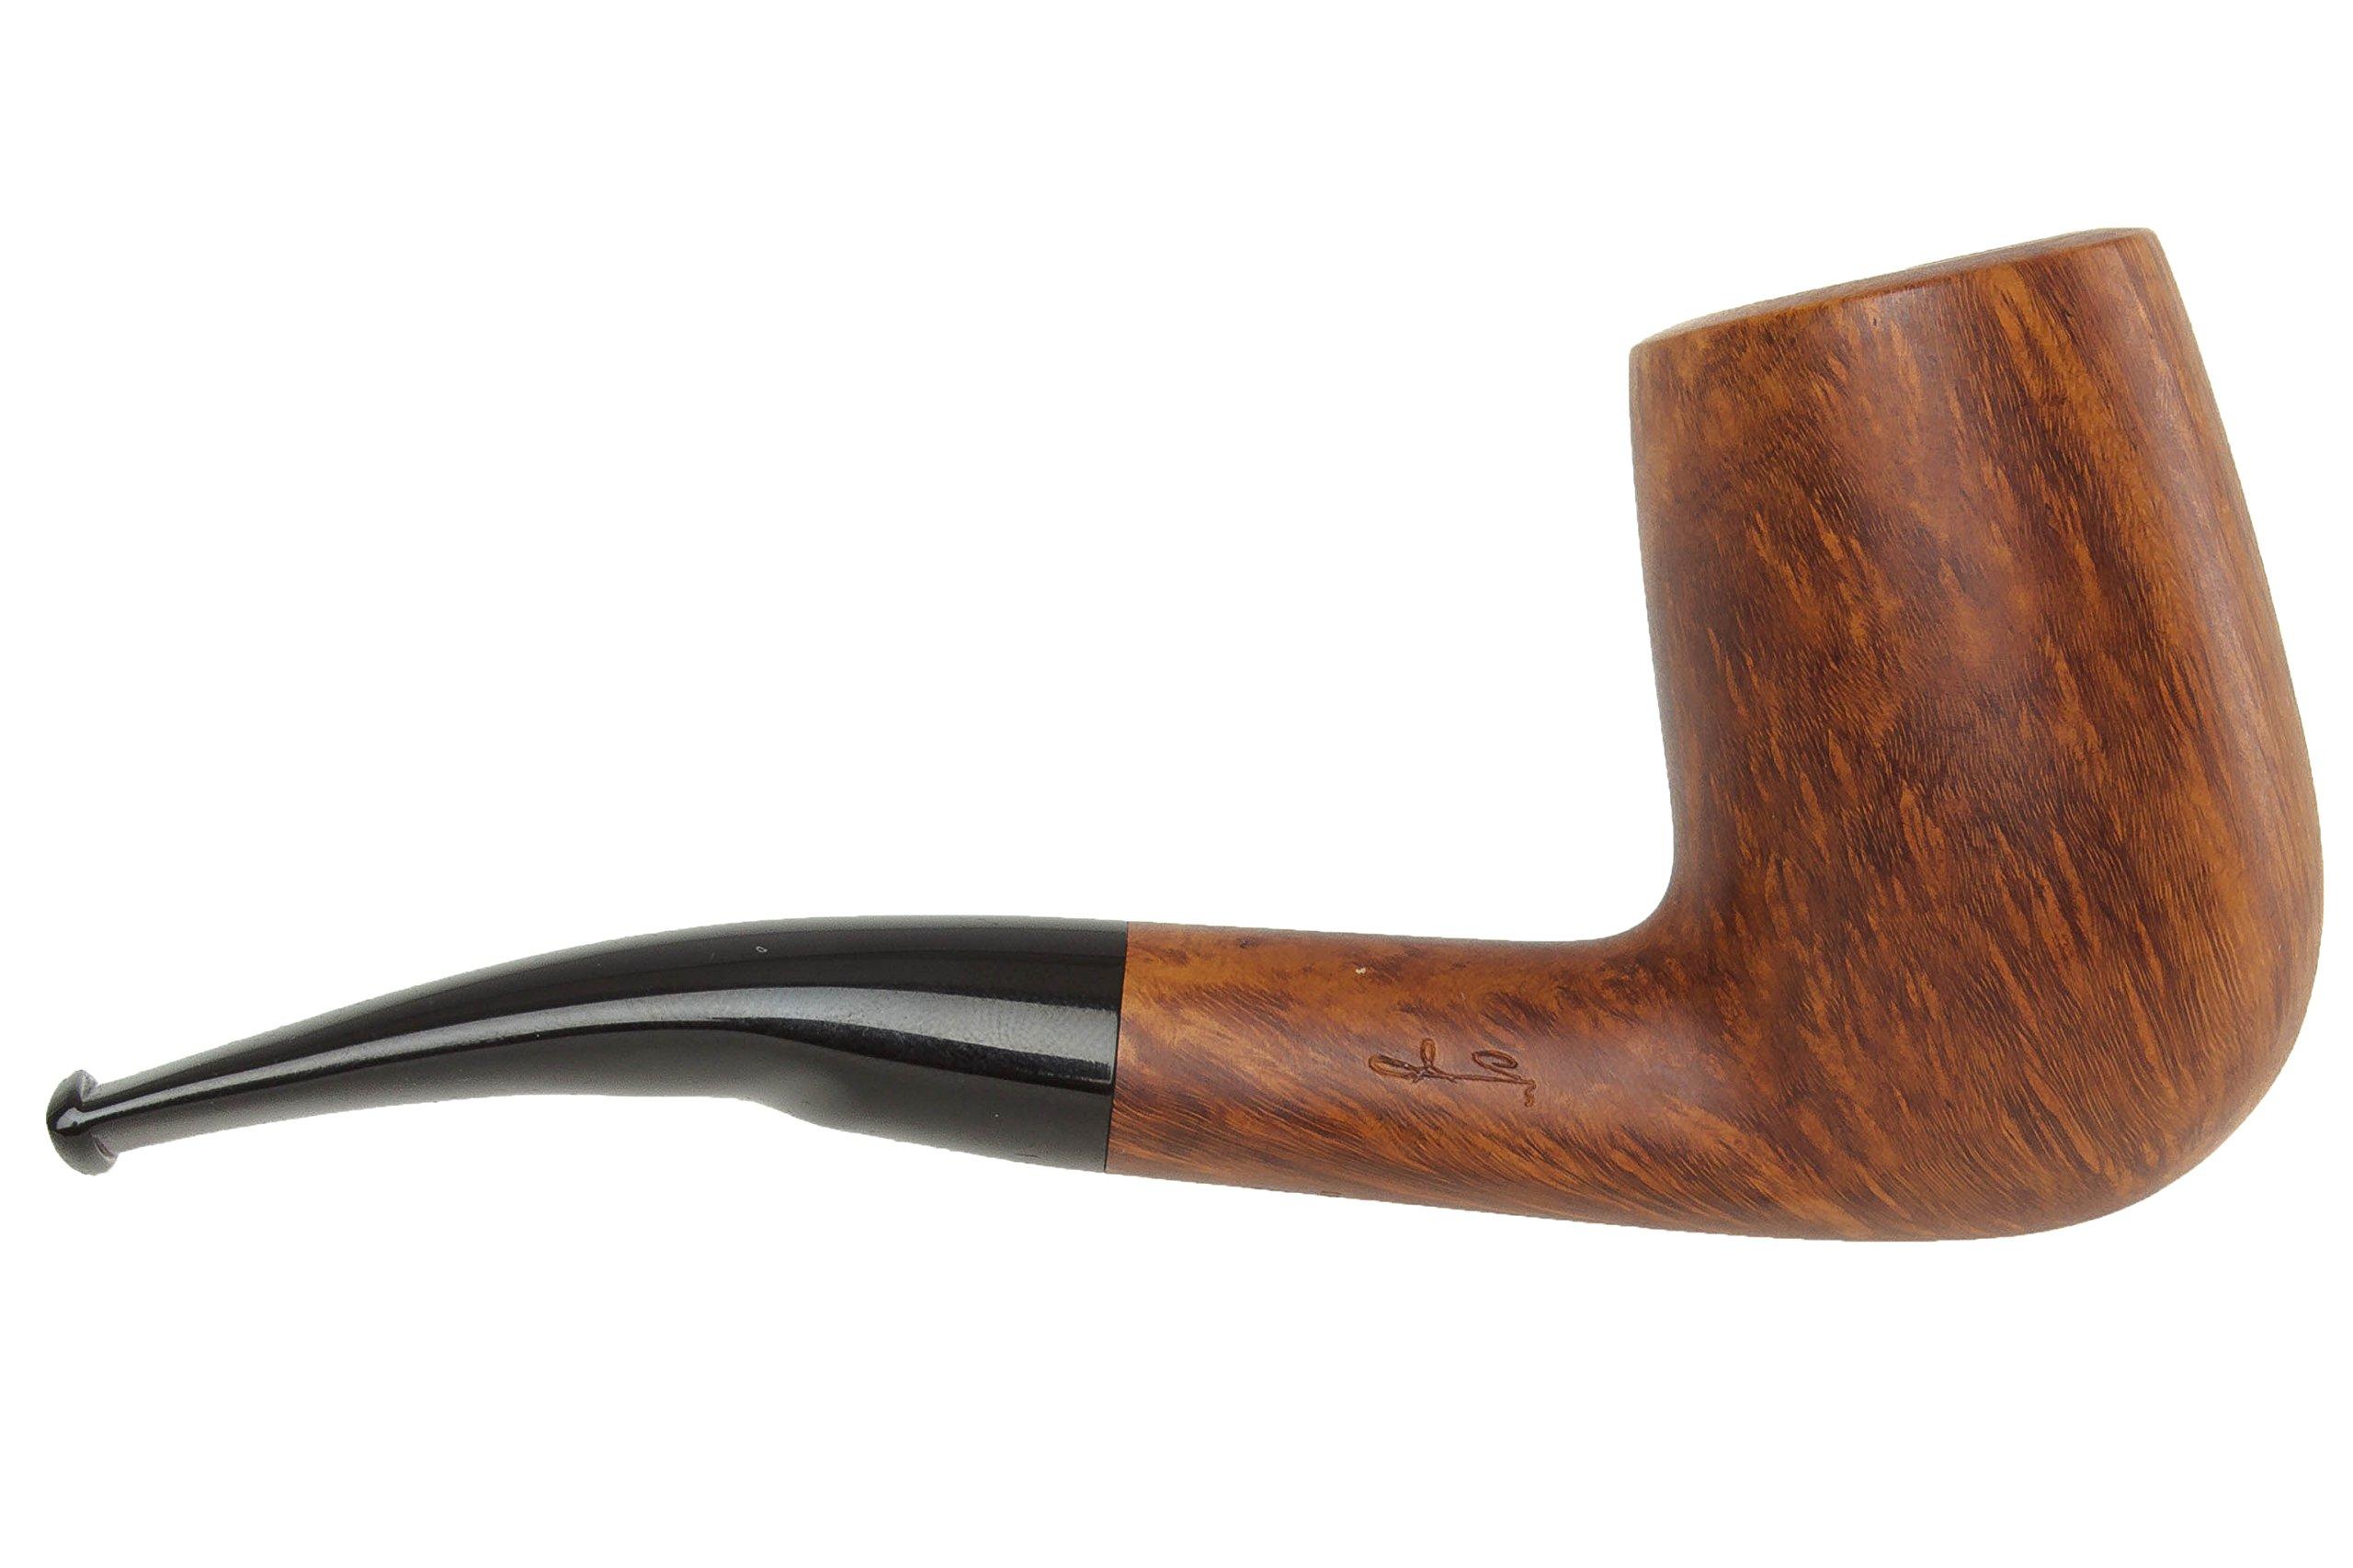 Savinelli Autograph Smooth 5 Tobacco Pipe - TP4122 by Savinelli (Image #2)